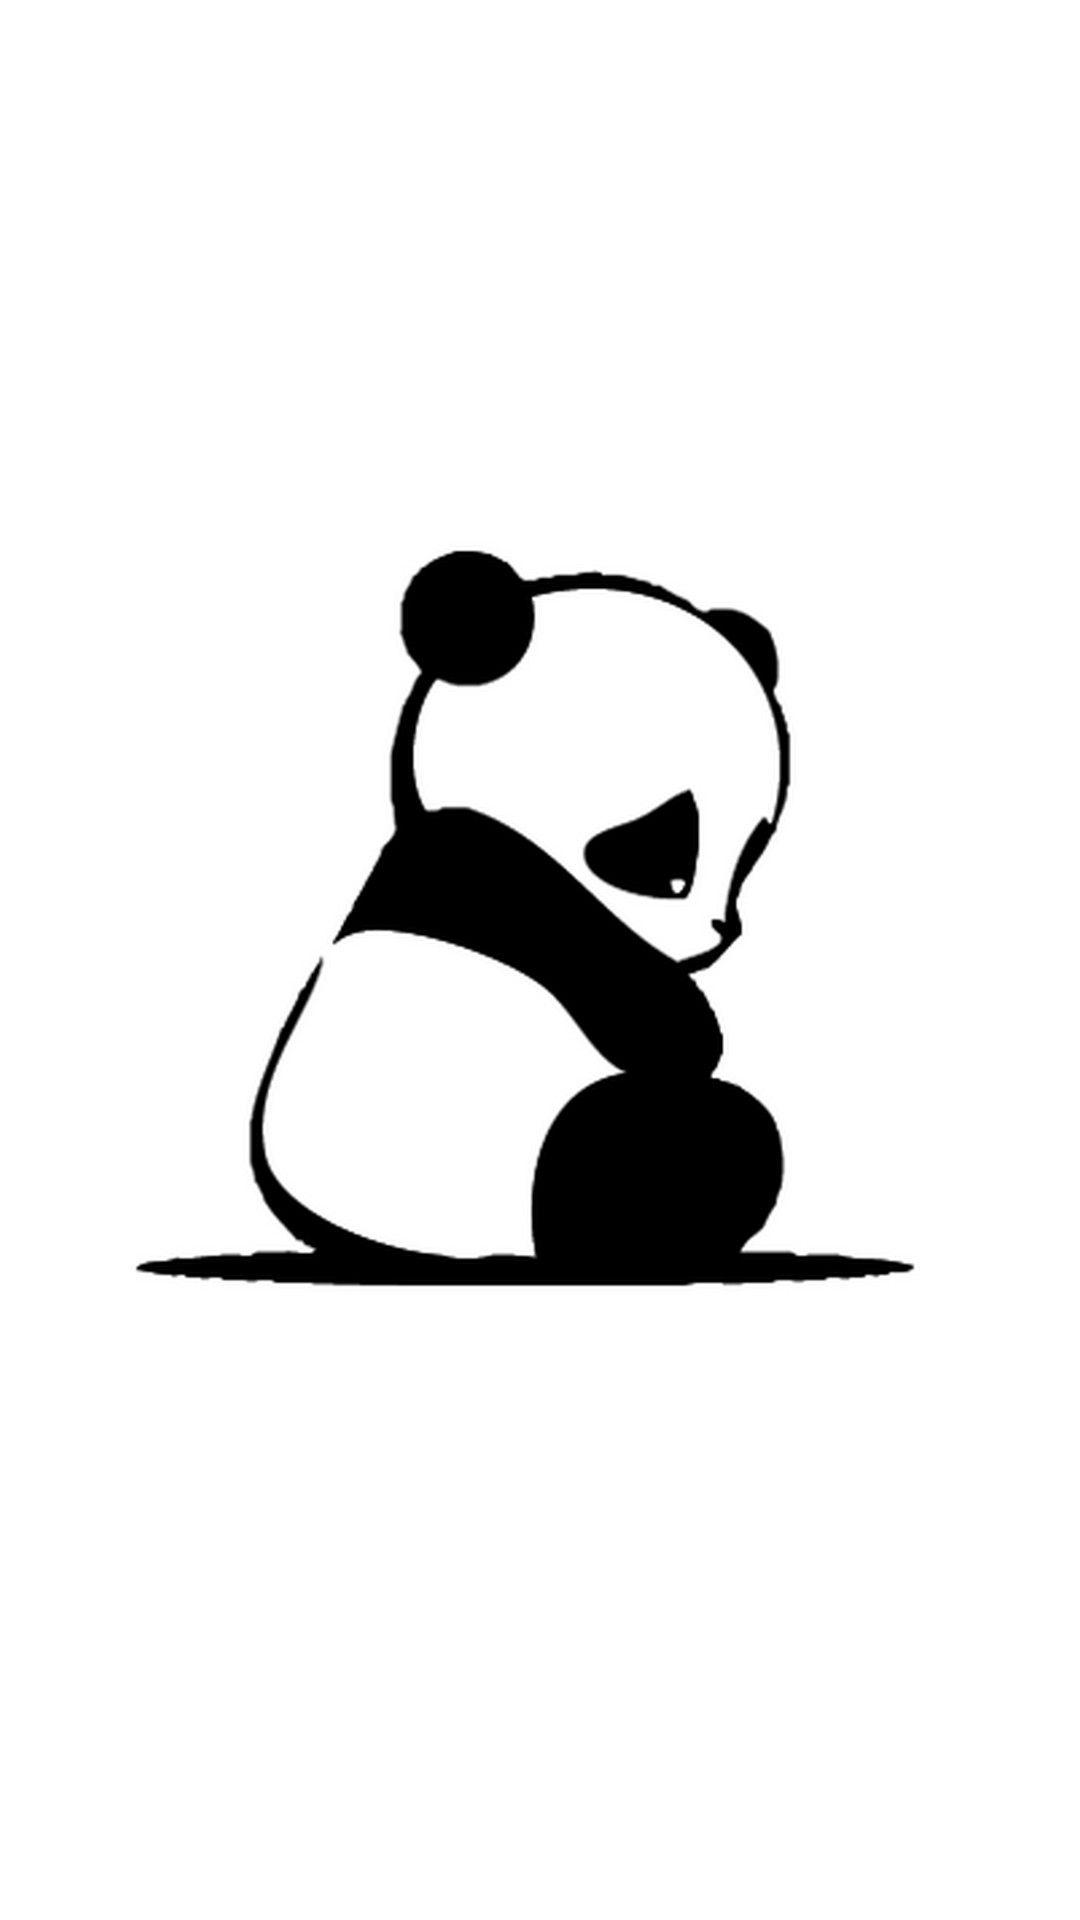 1080x1920 Cute Baby Panda Wallpaper For Mobile Best Hd Wallpapers